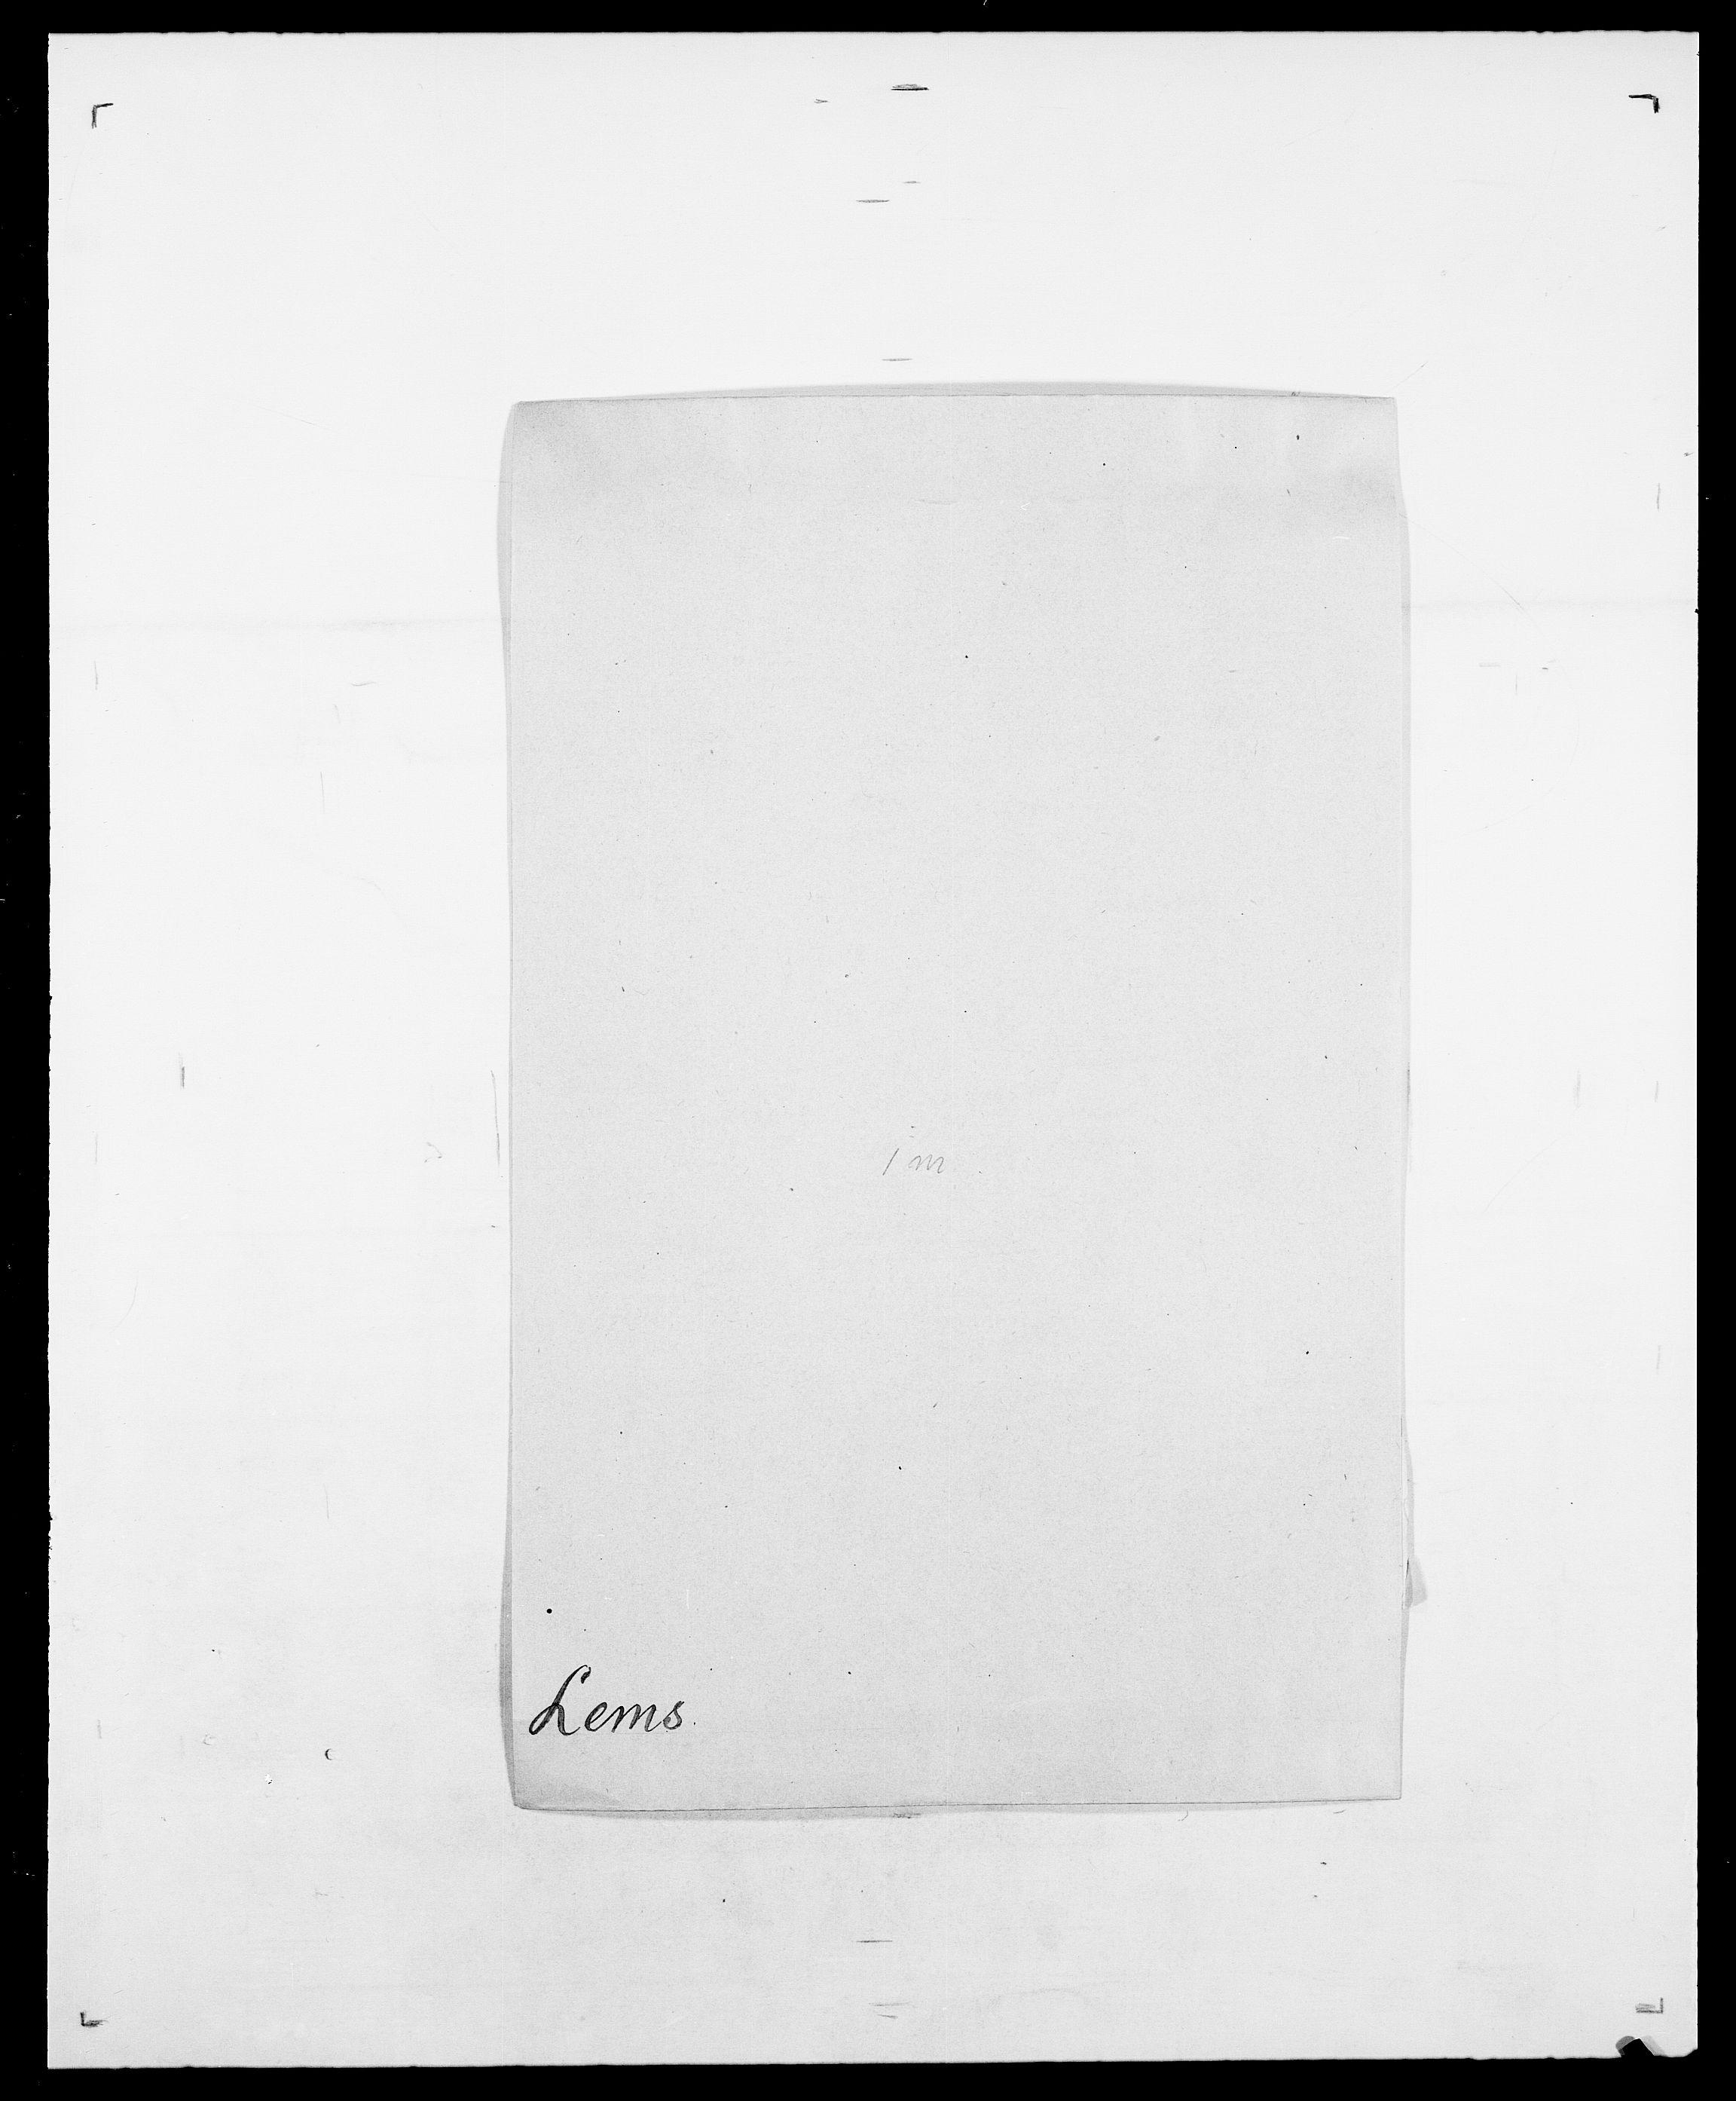 SAO, Delgobe, Charles Antoine - samling, D/Da/L0023: Lau - Lirvyn, s. 196